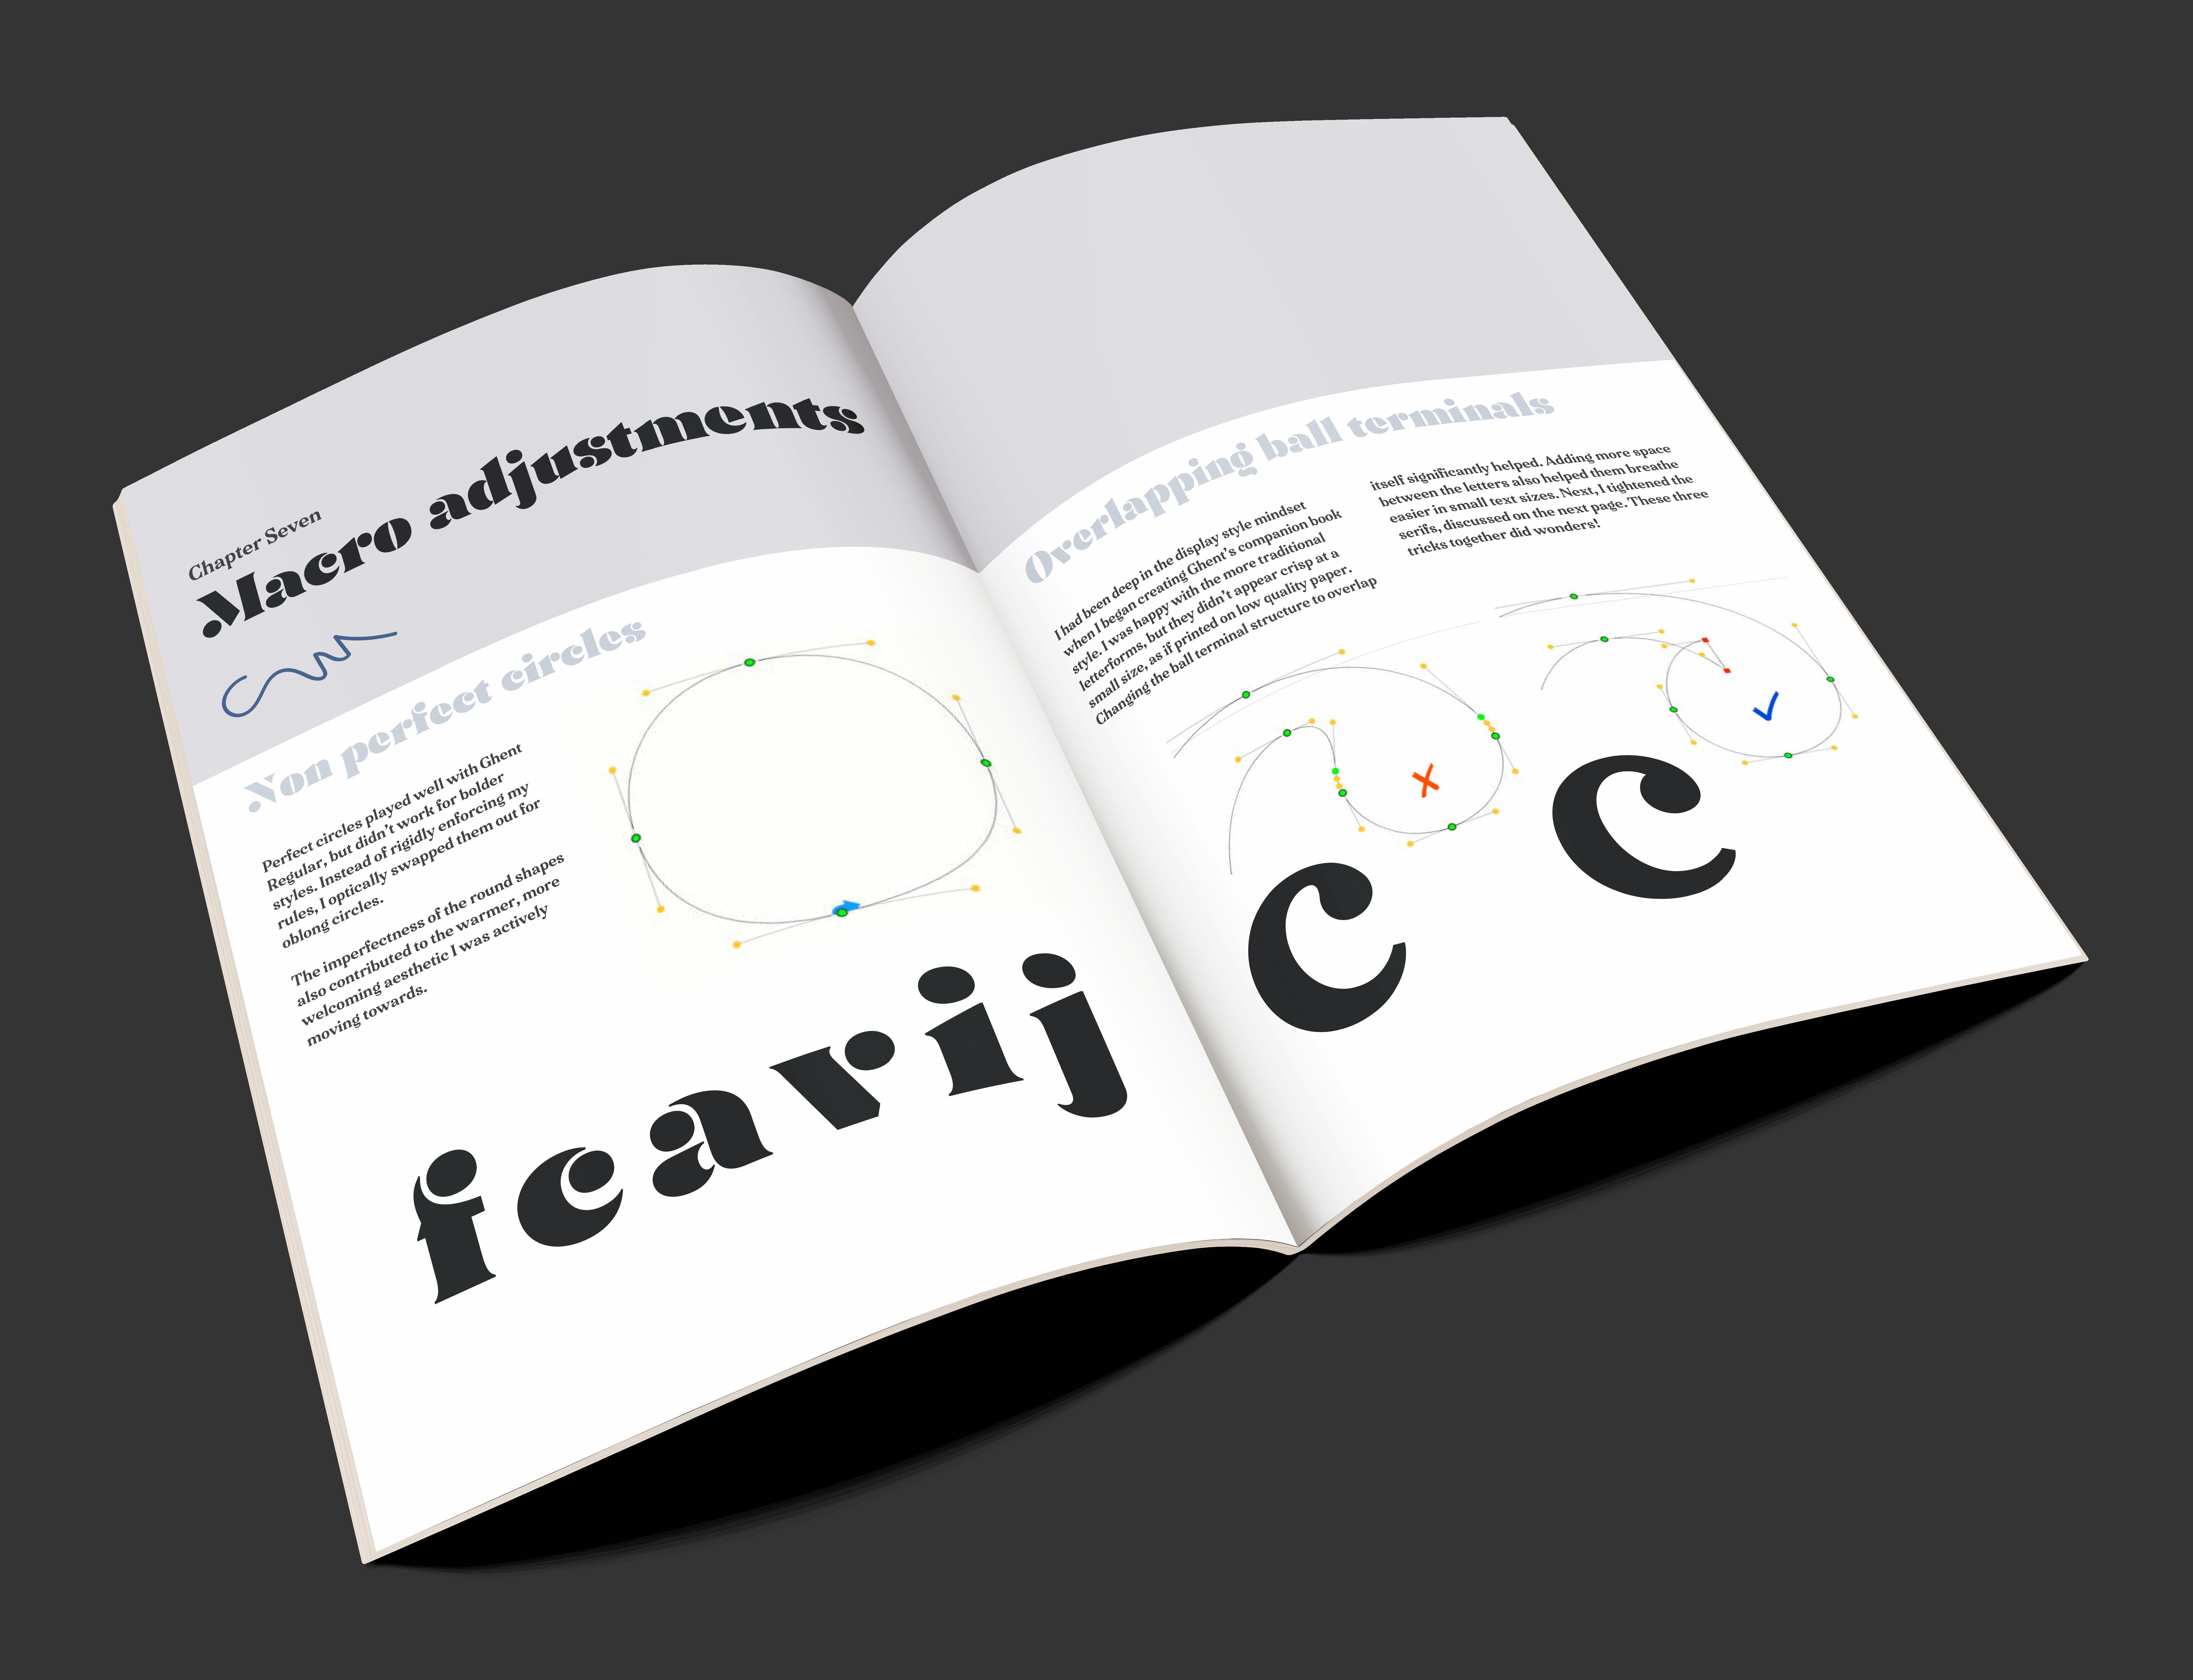 Ghent Process Book